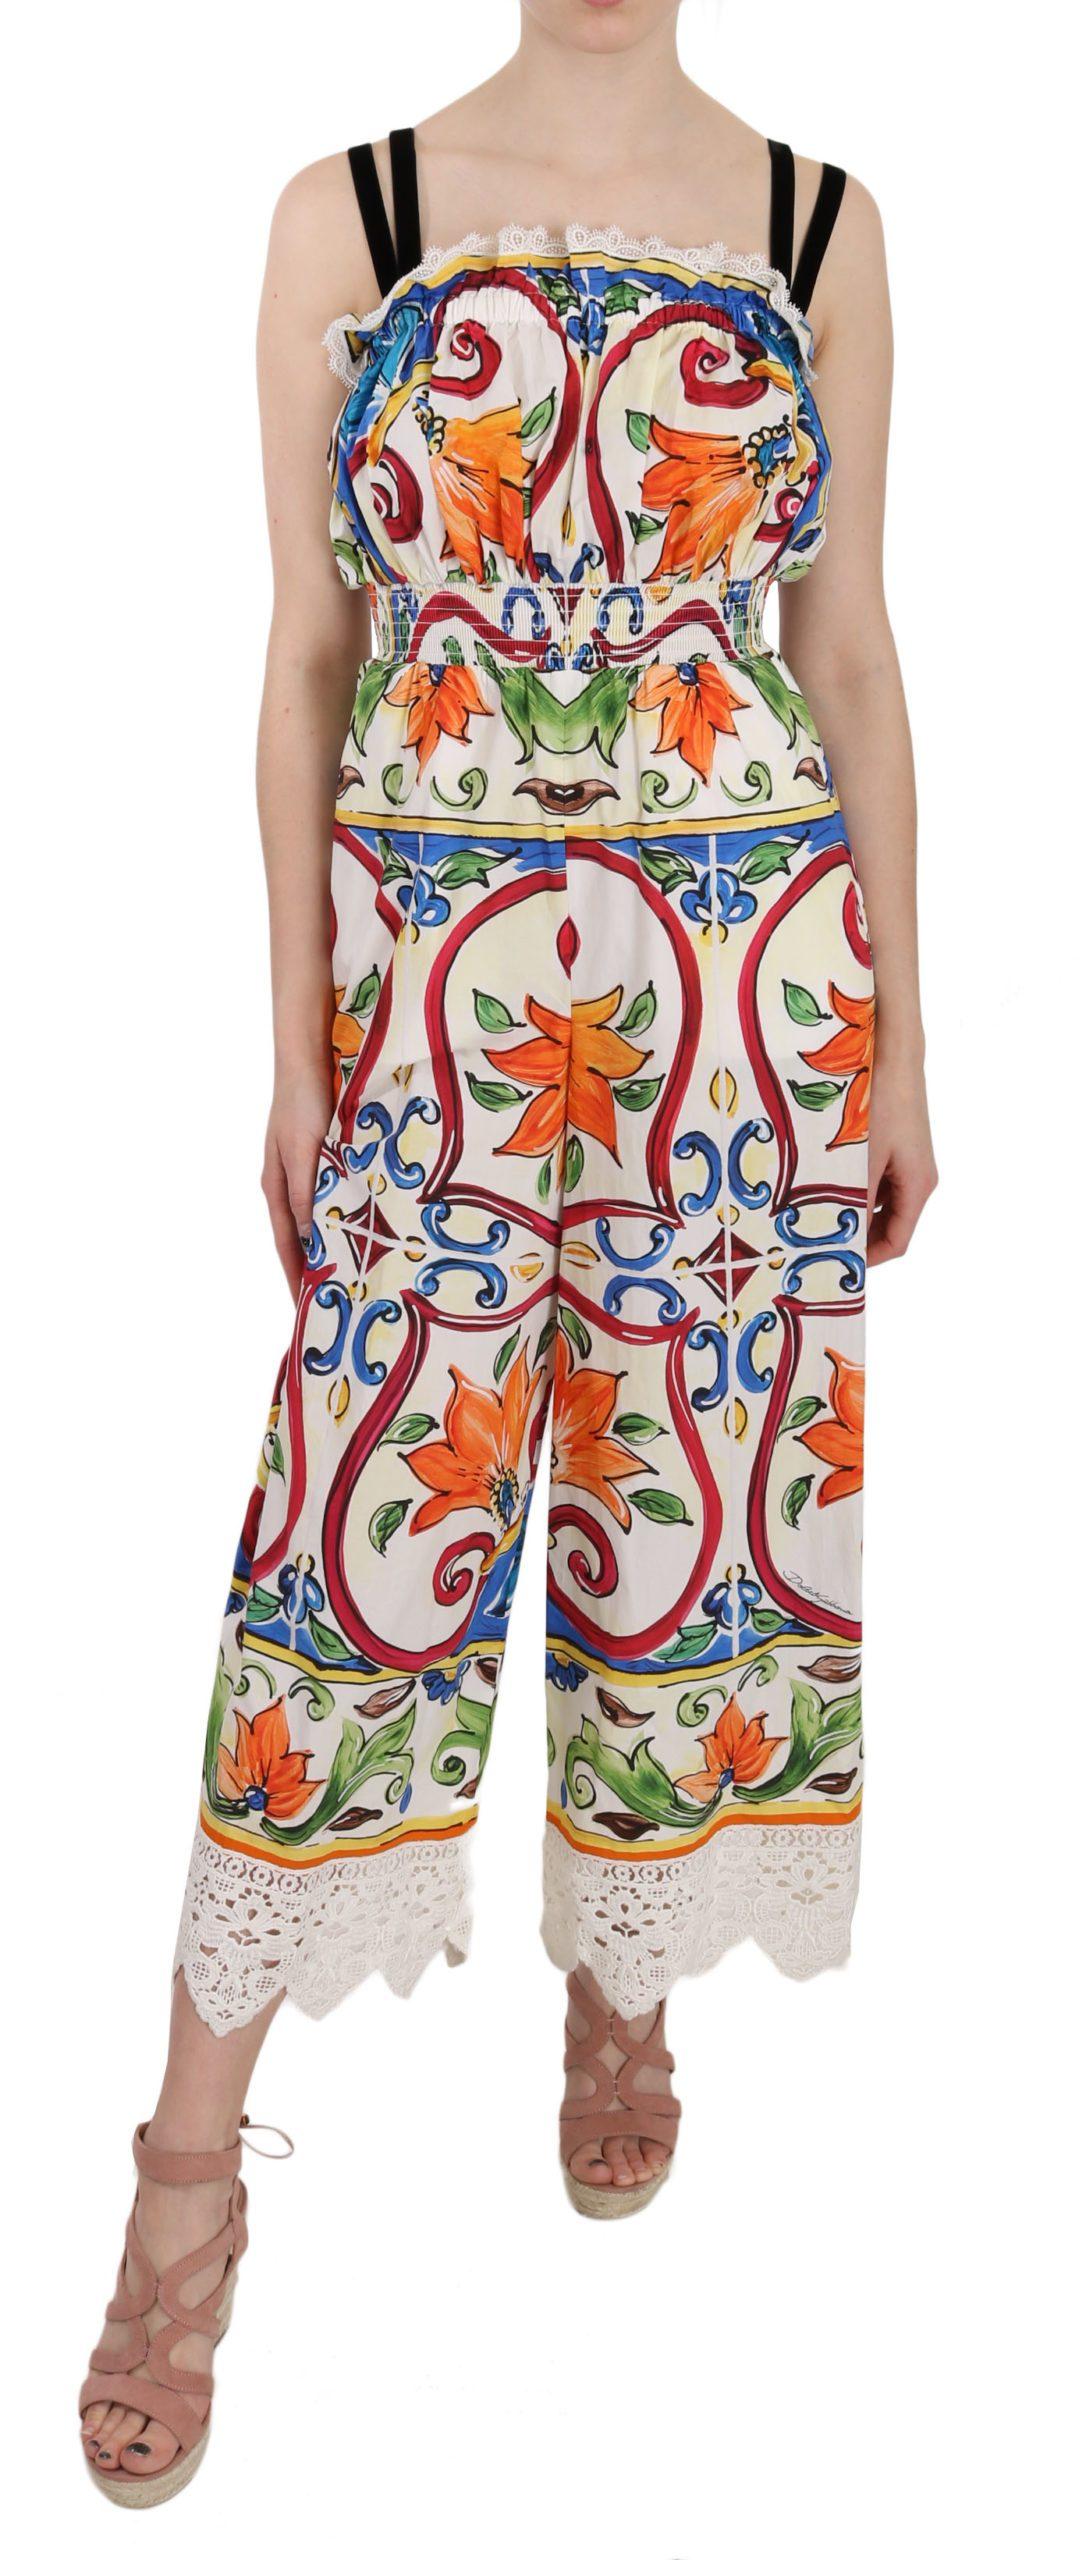 Dolce & Gabbana Women's Majolica Cotton Dress Multicolor DR1674 - IT38|XS